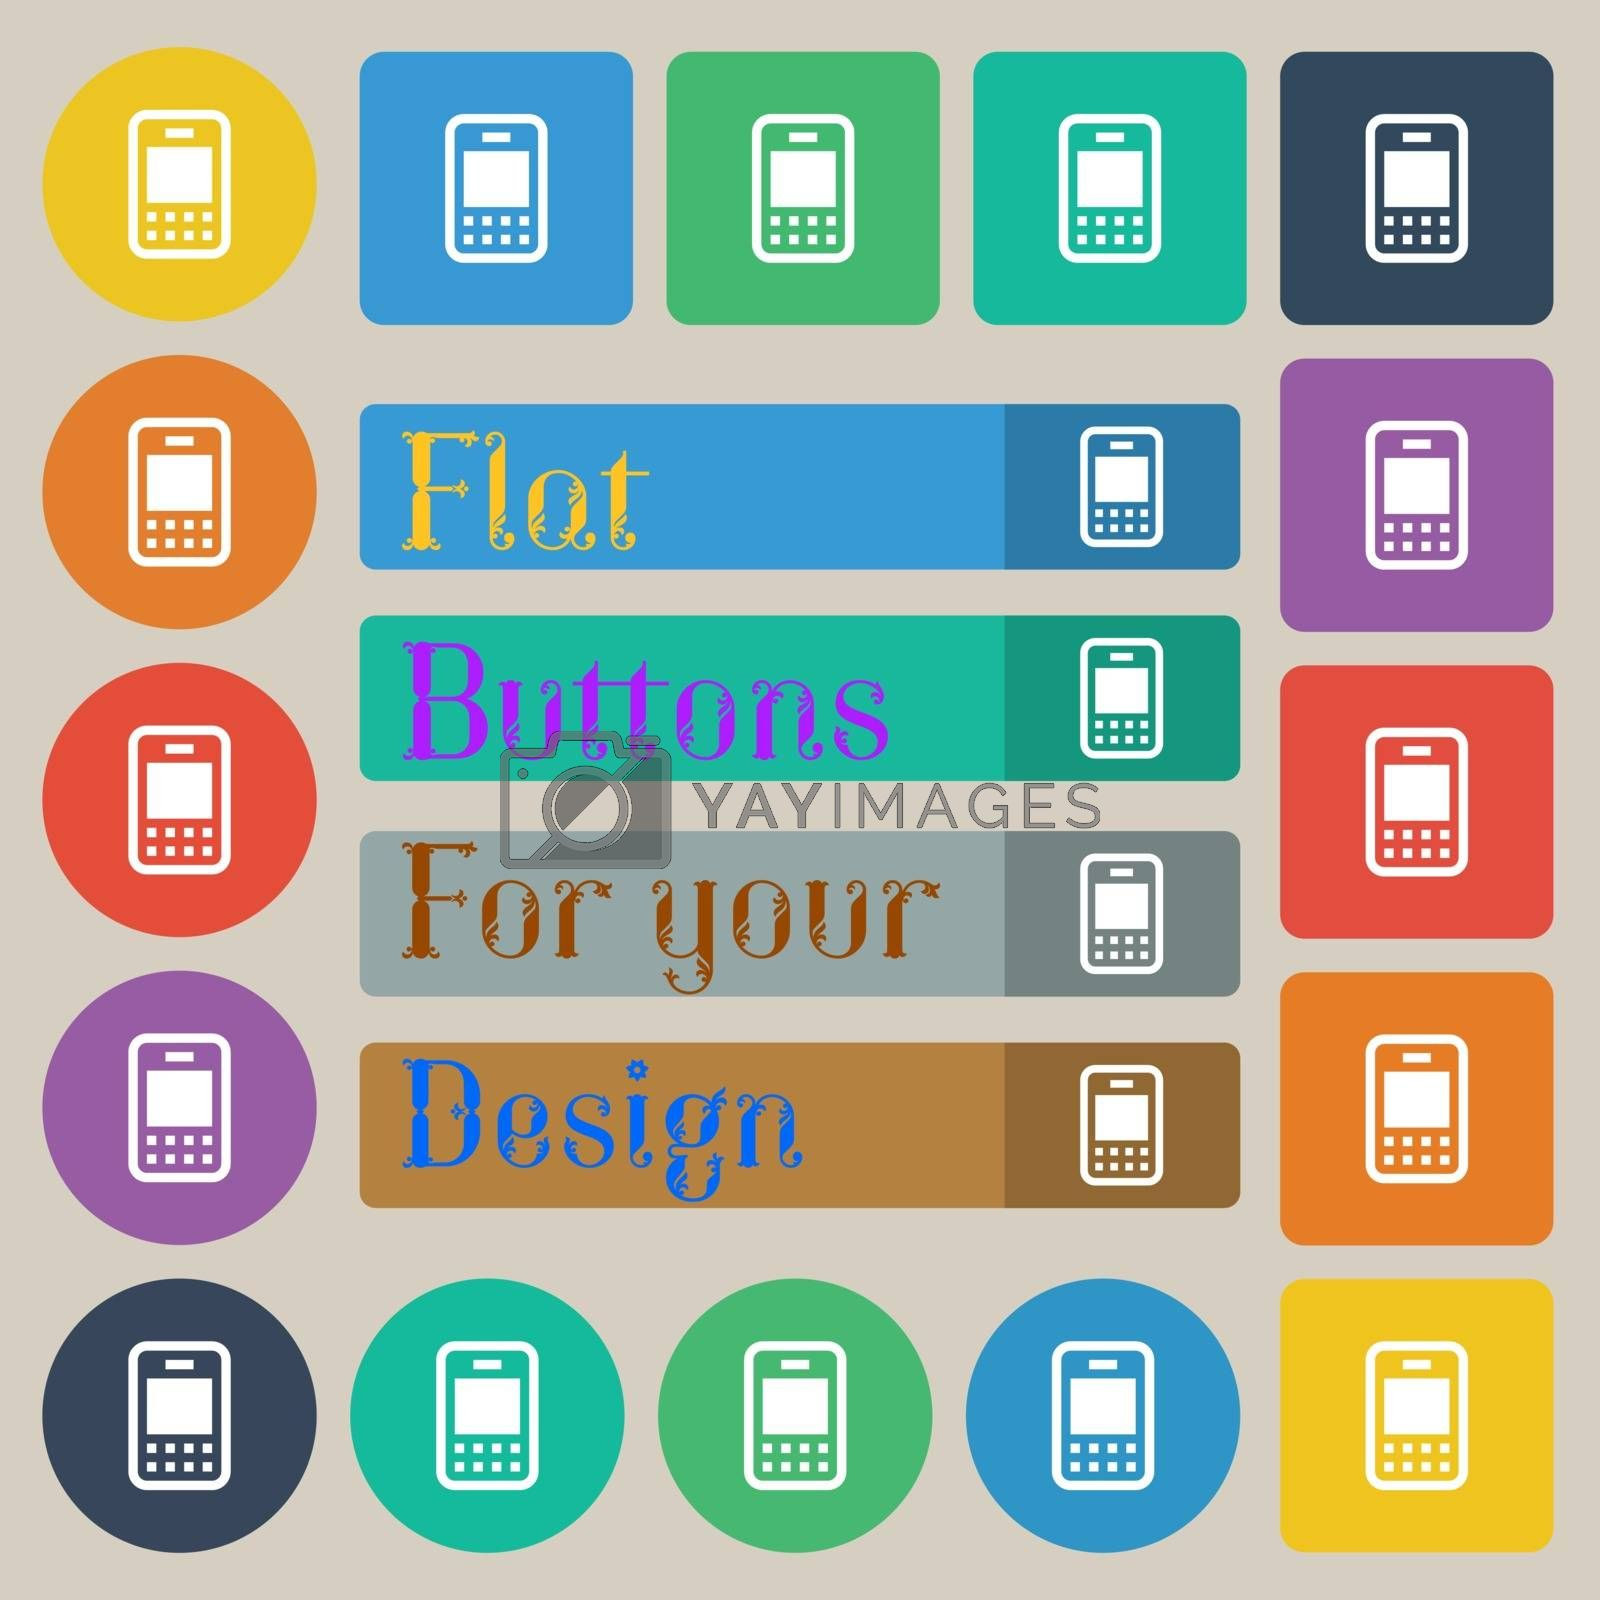 Royalty free image of Mobile telecommunications technology  by serhii_lohvyniuk